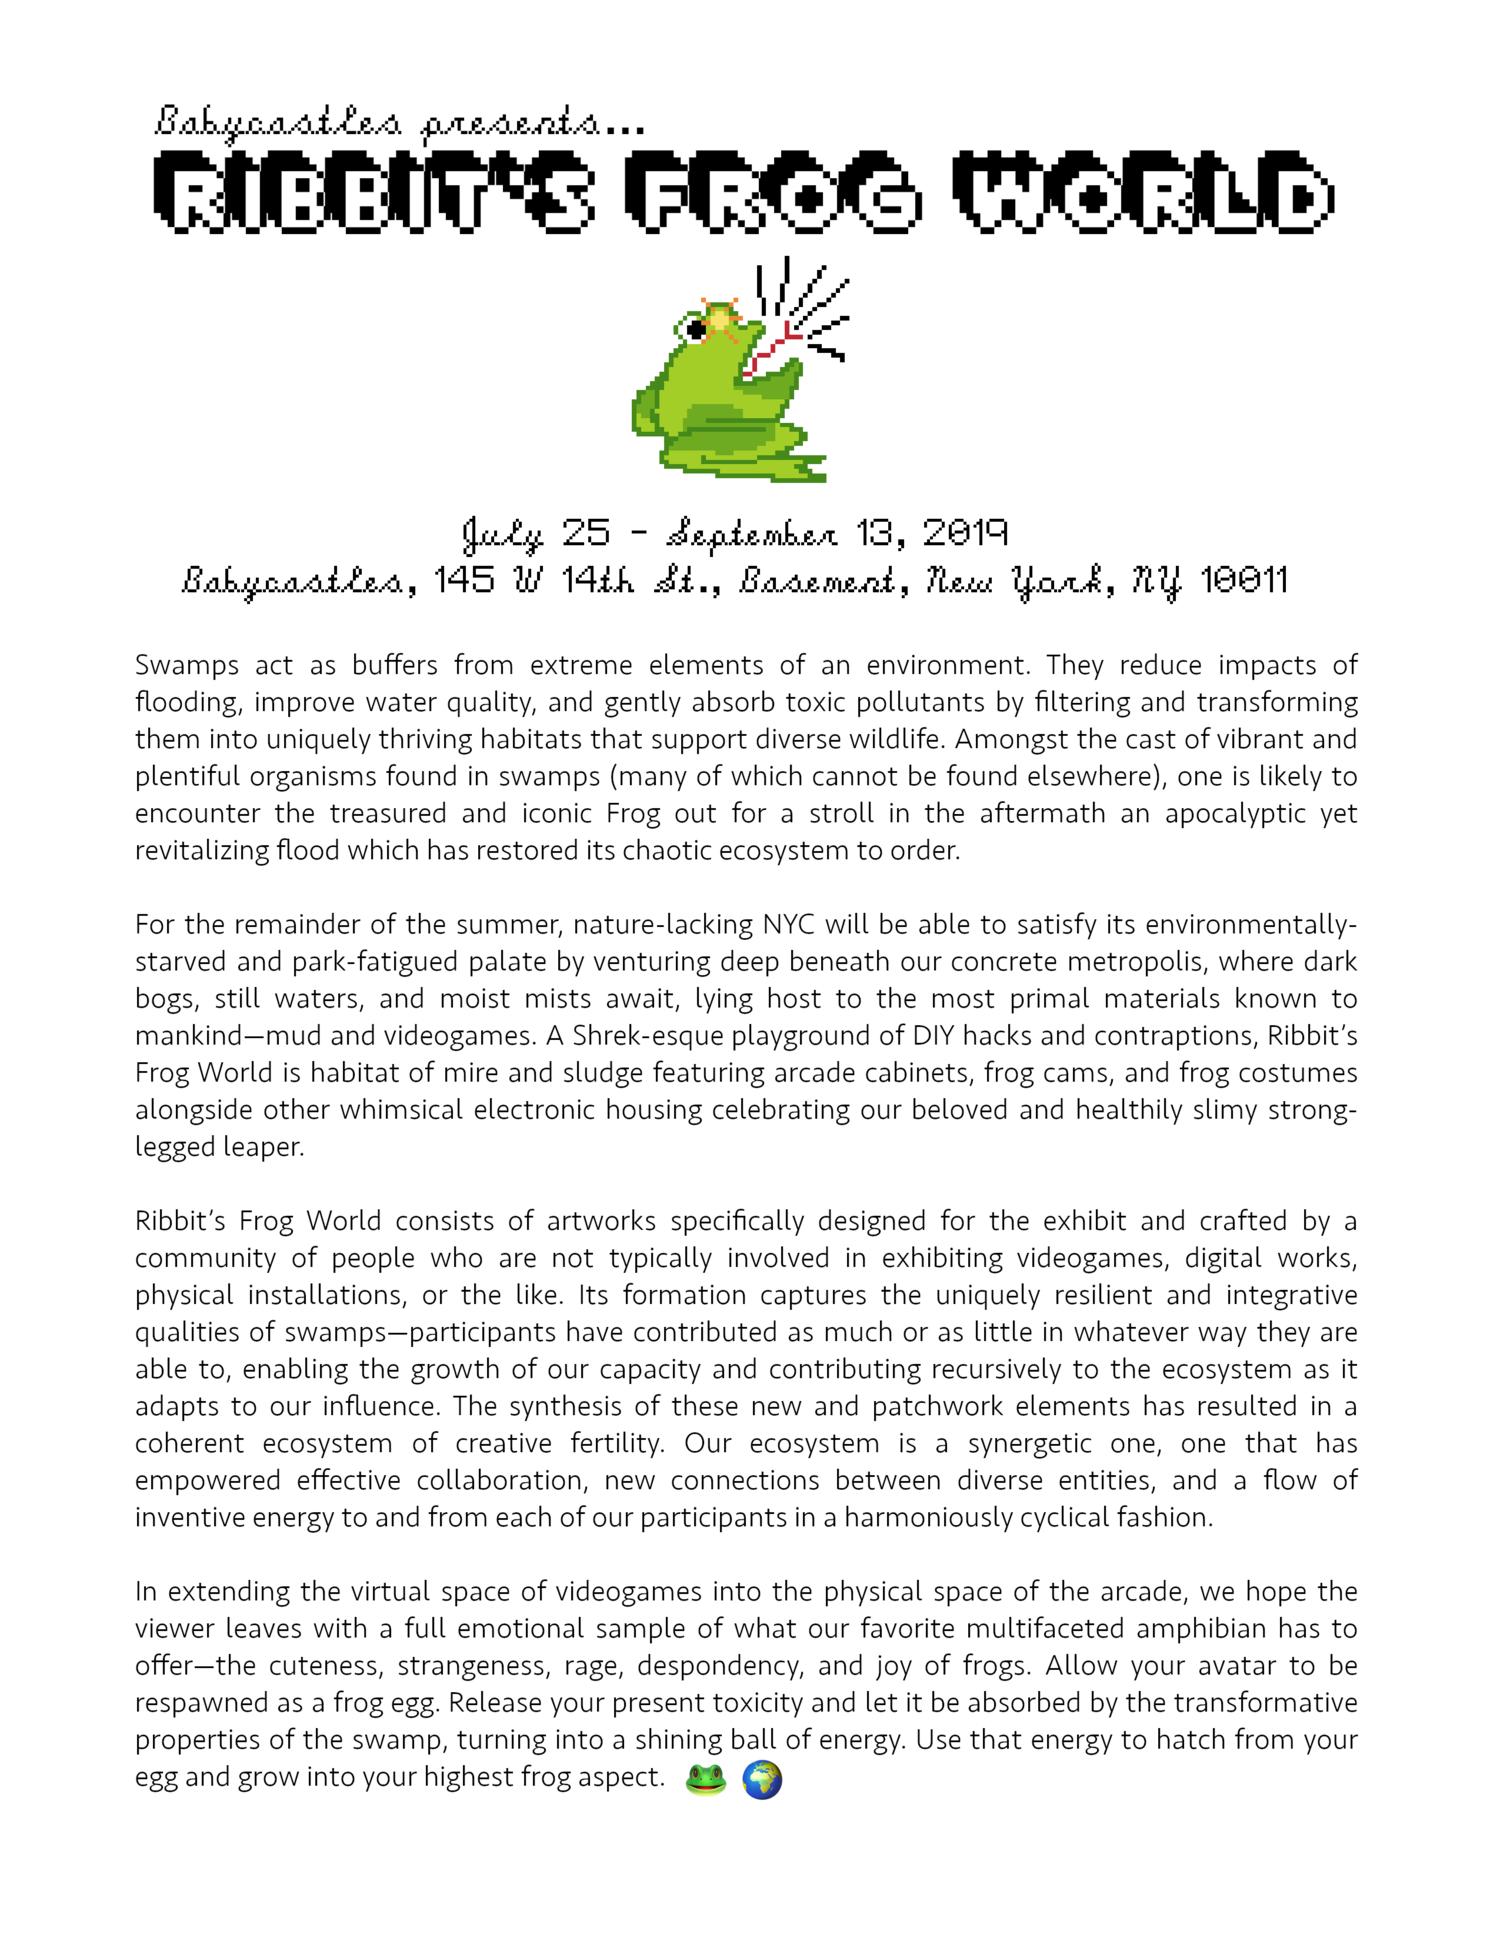 Ribbit's+Frog+World+-+Statement.png